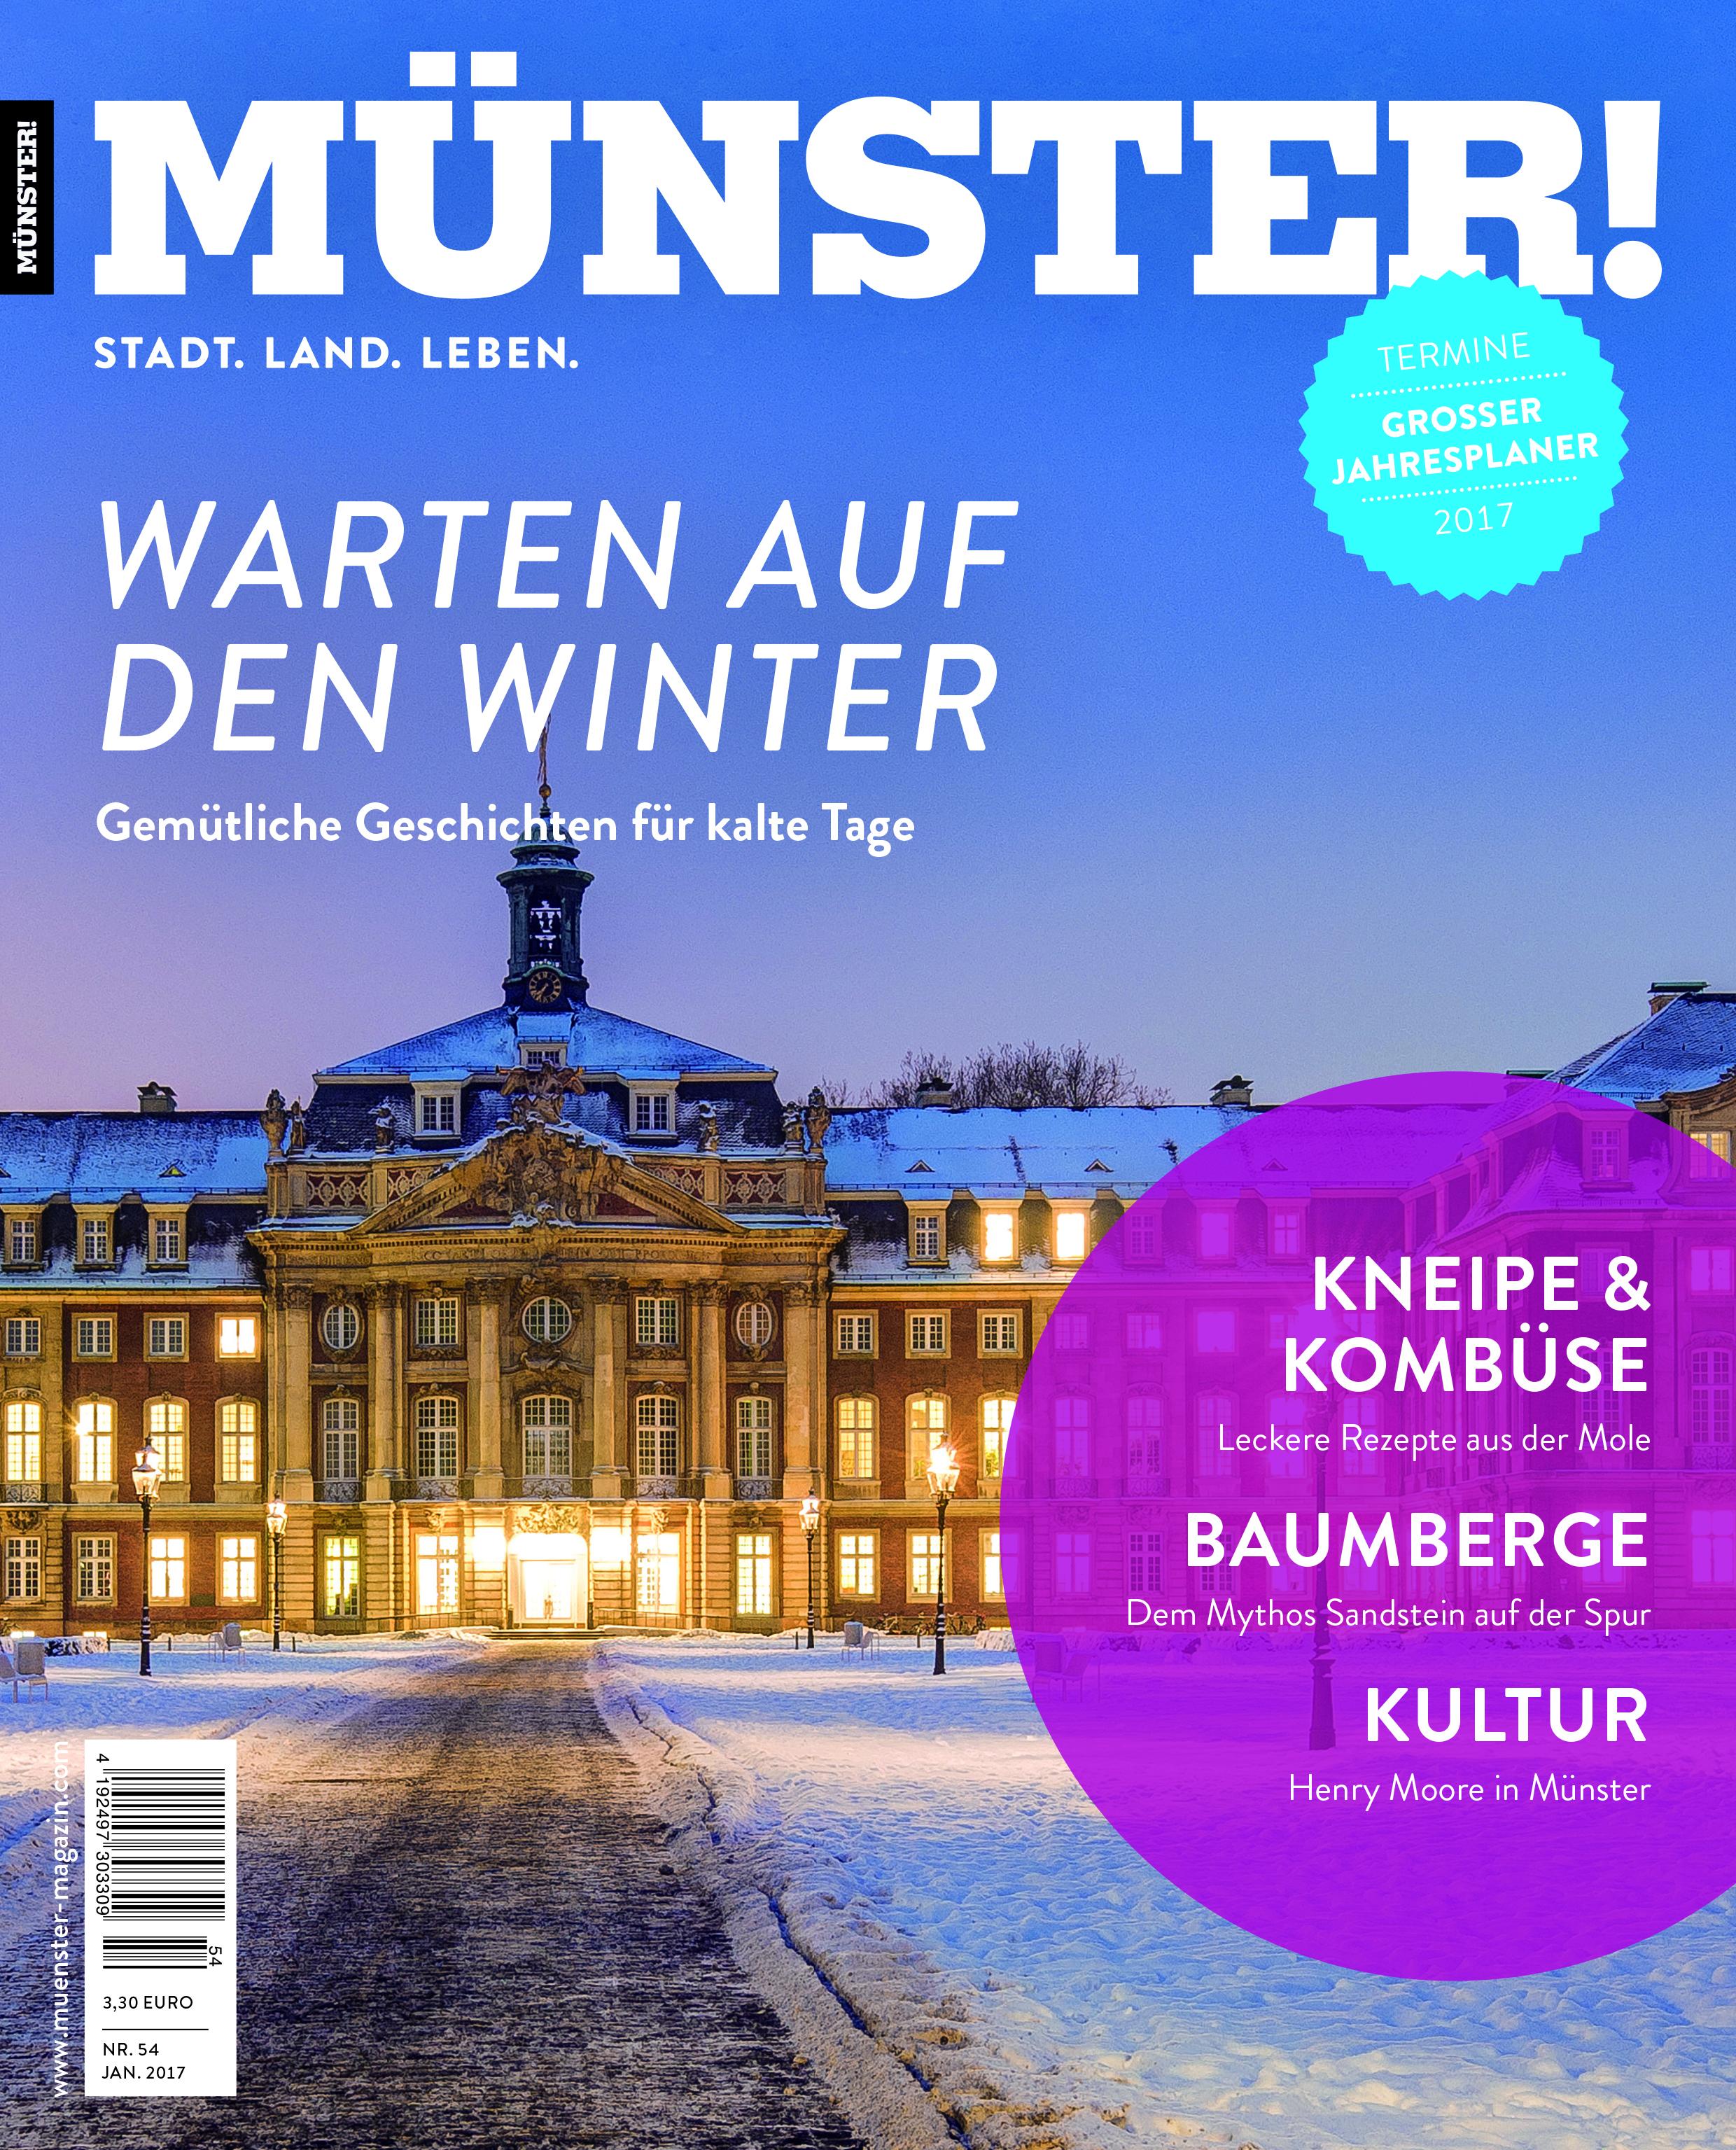 MÜNSTER! Januar 2017